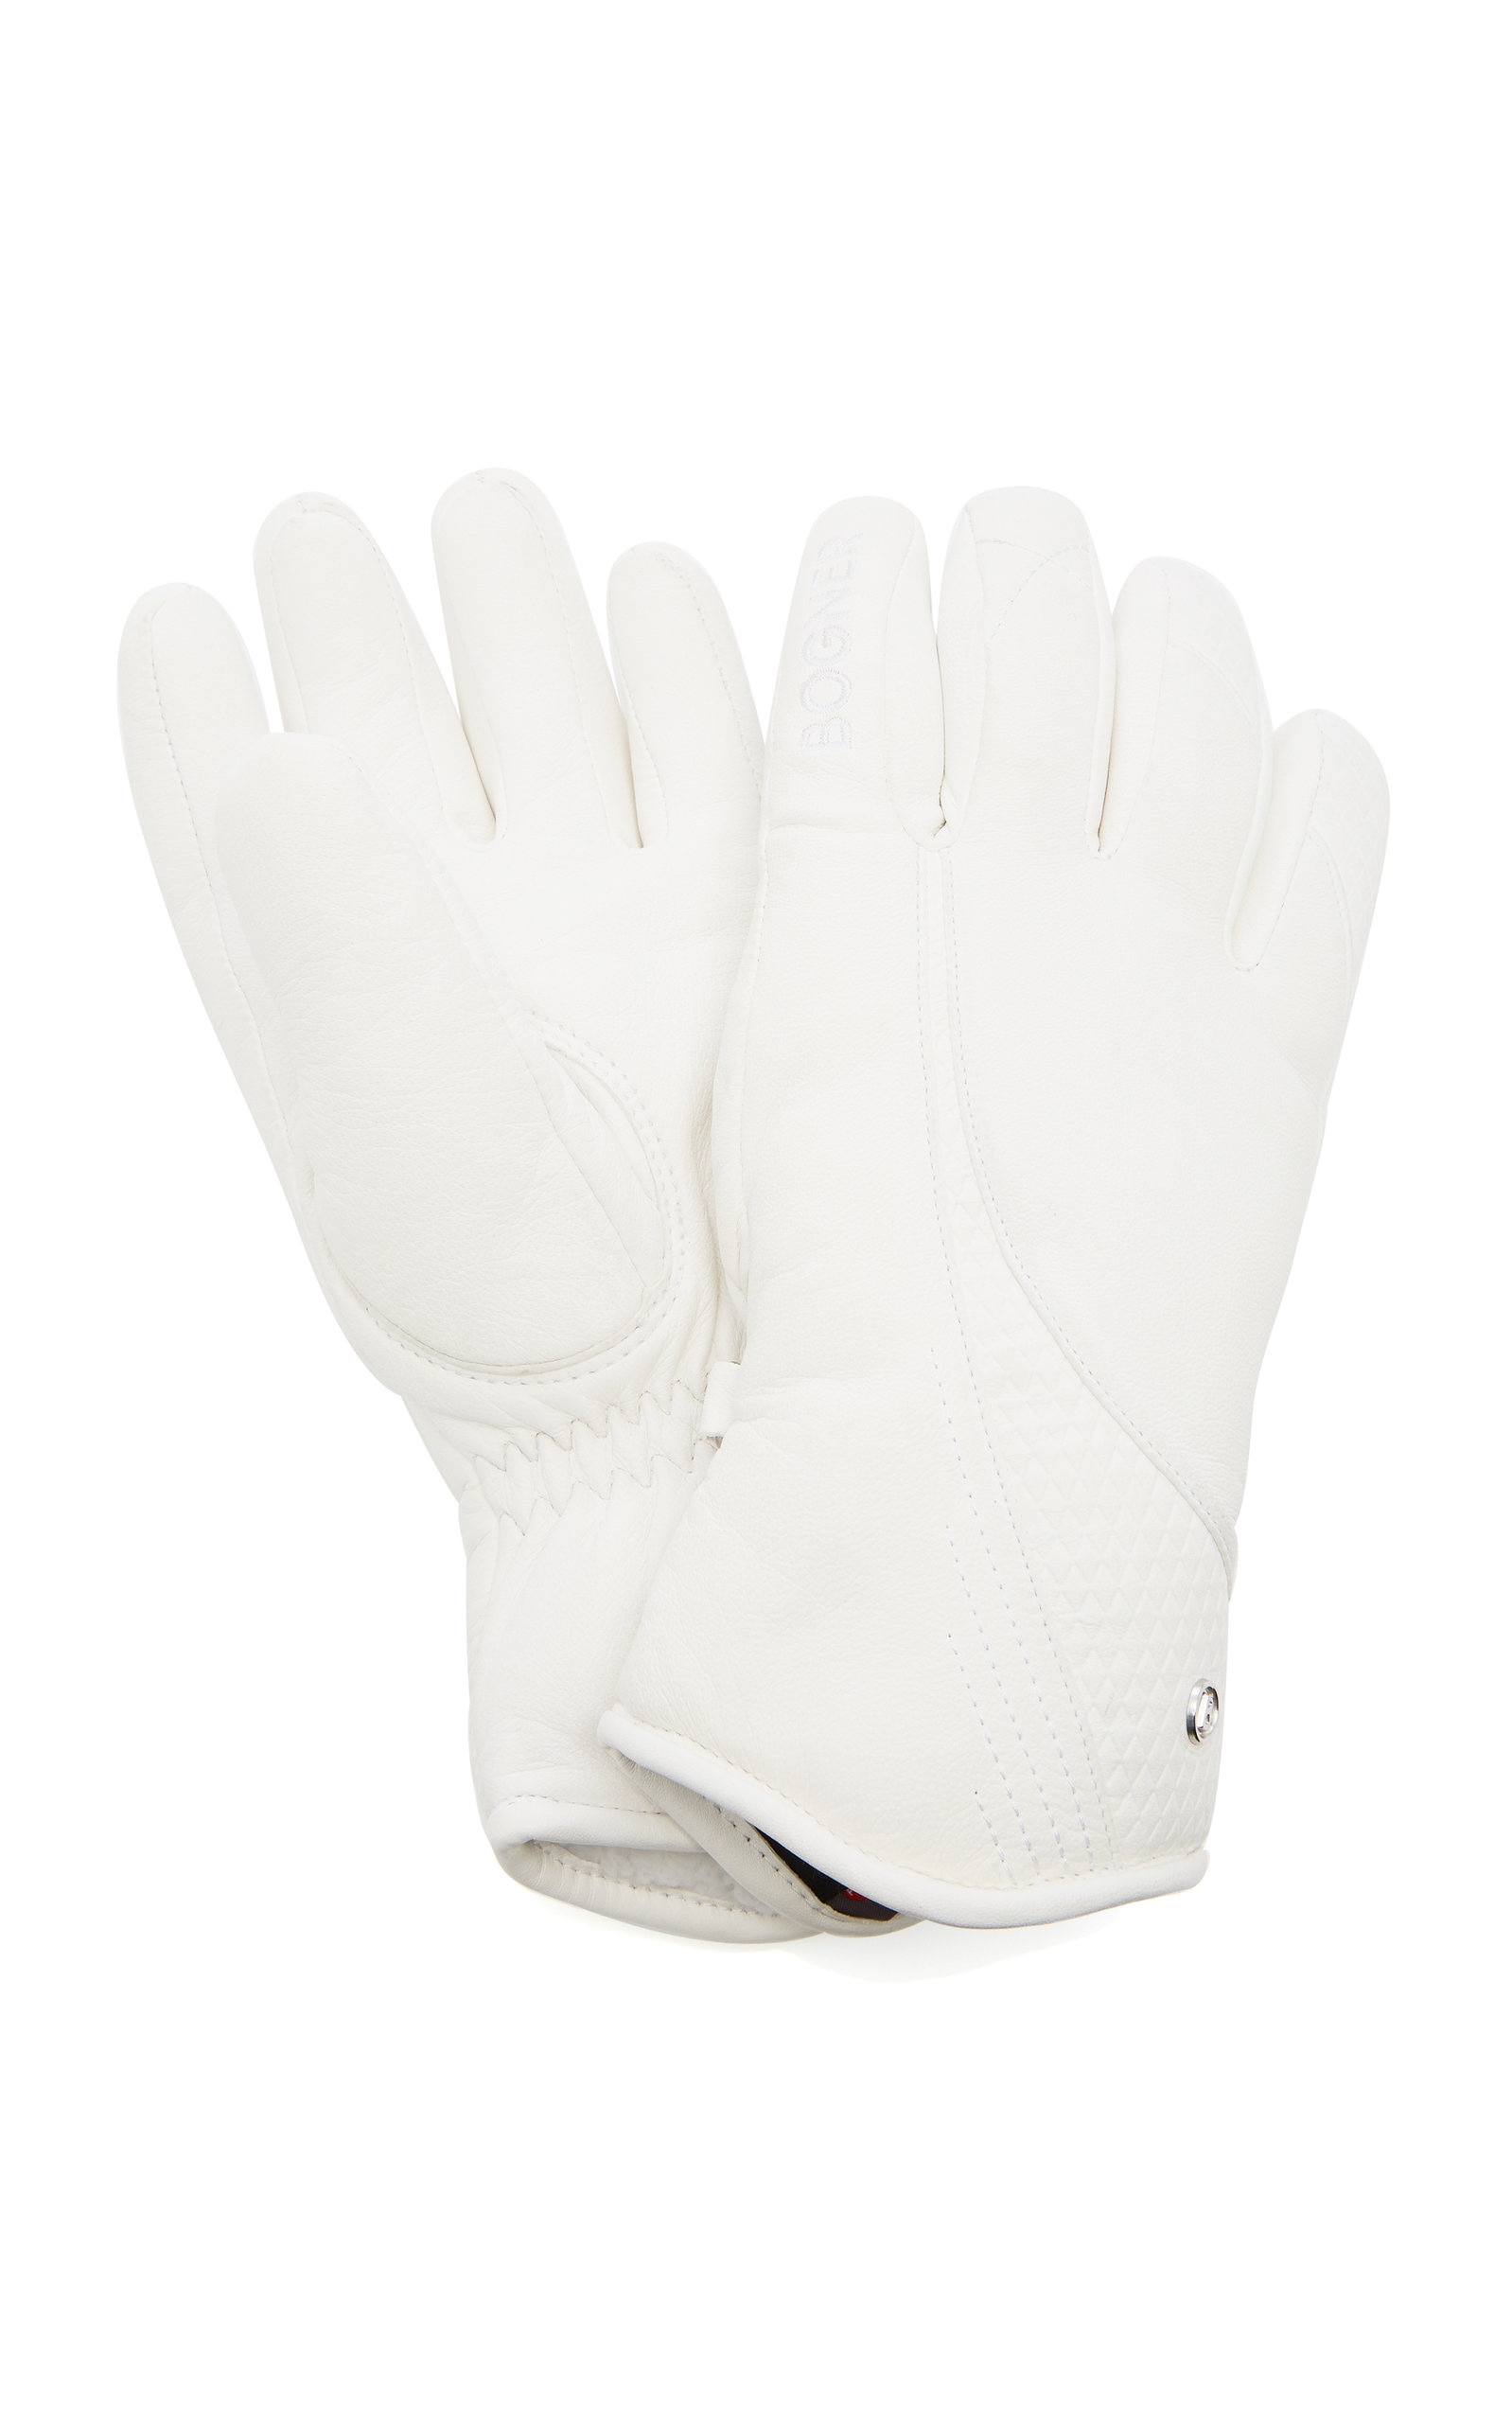 Meli Embossed Leather Ski Gloves in White